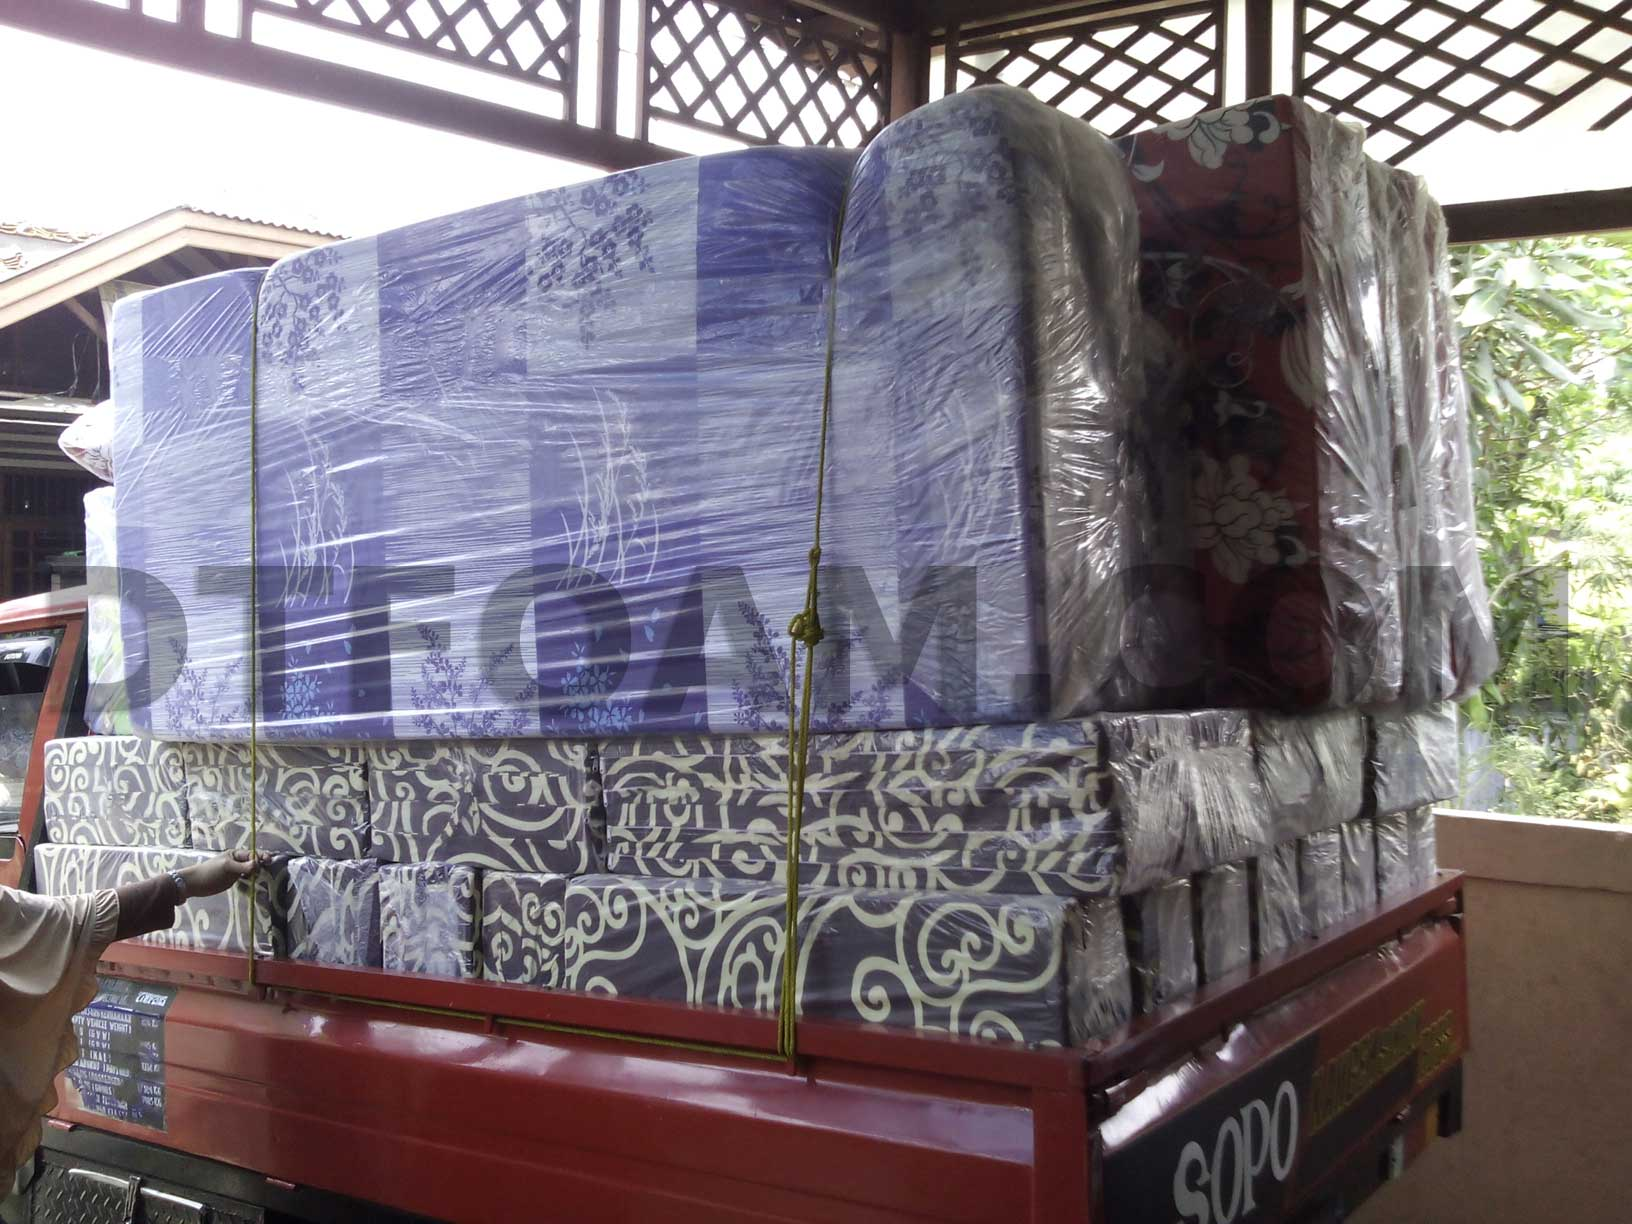 sofa bed kasur busa lipat inoac jakarta coaster roy reviews murah dtfoam com